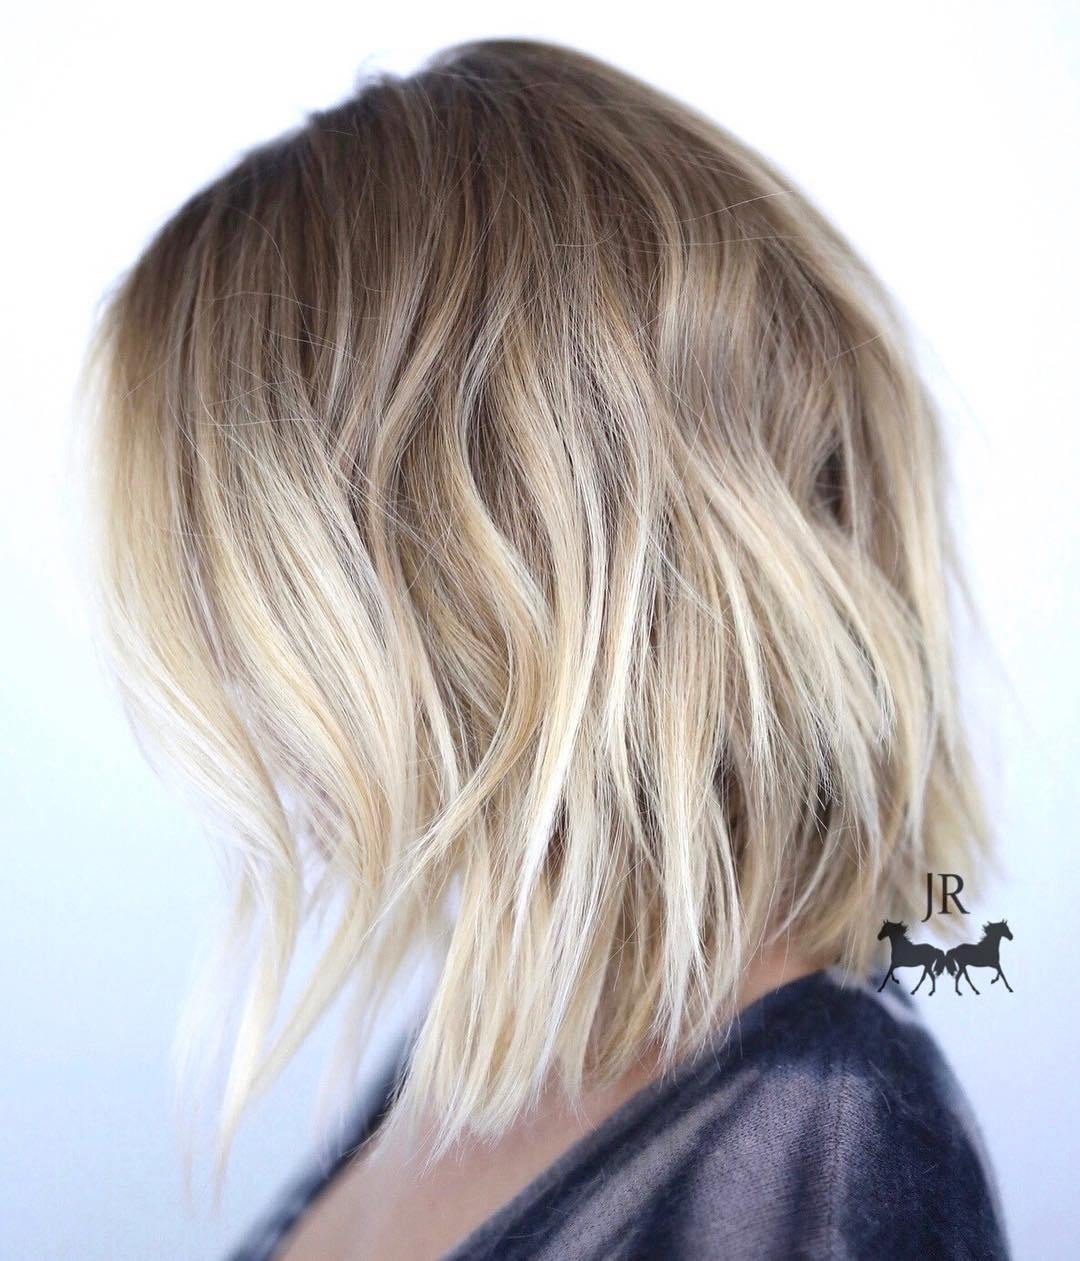 19-blonde-choppy-lob 19-blonde-choppy-lob-1